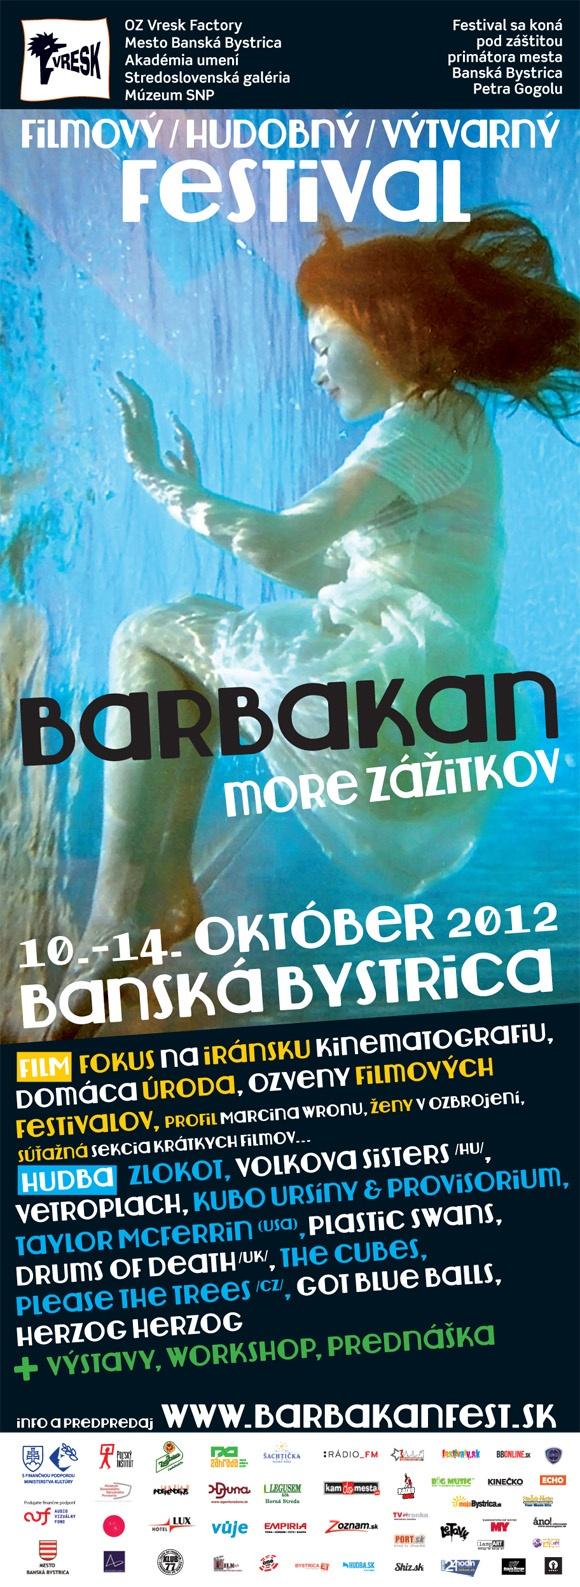 BARBAKAN festival 2012 Banská Bystrica